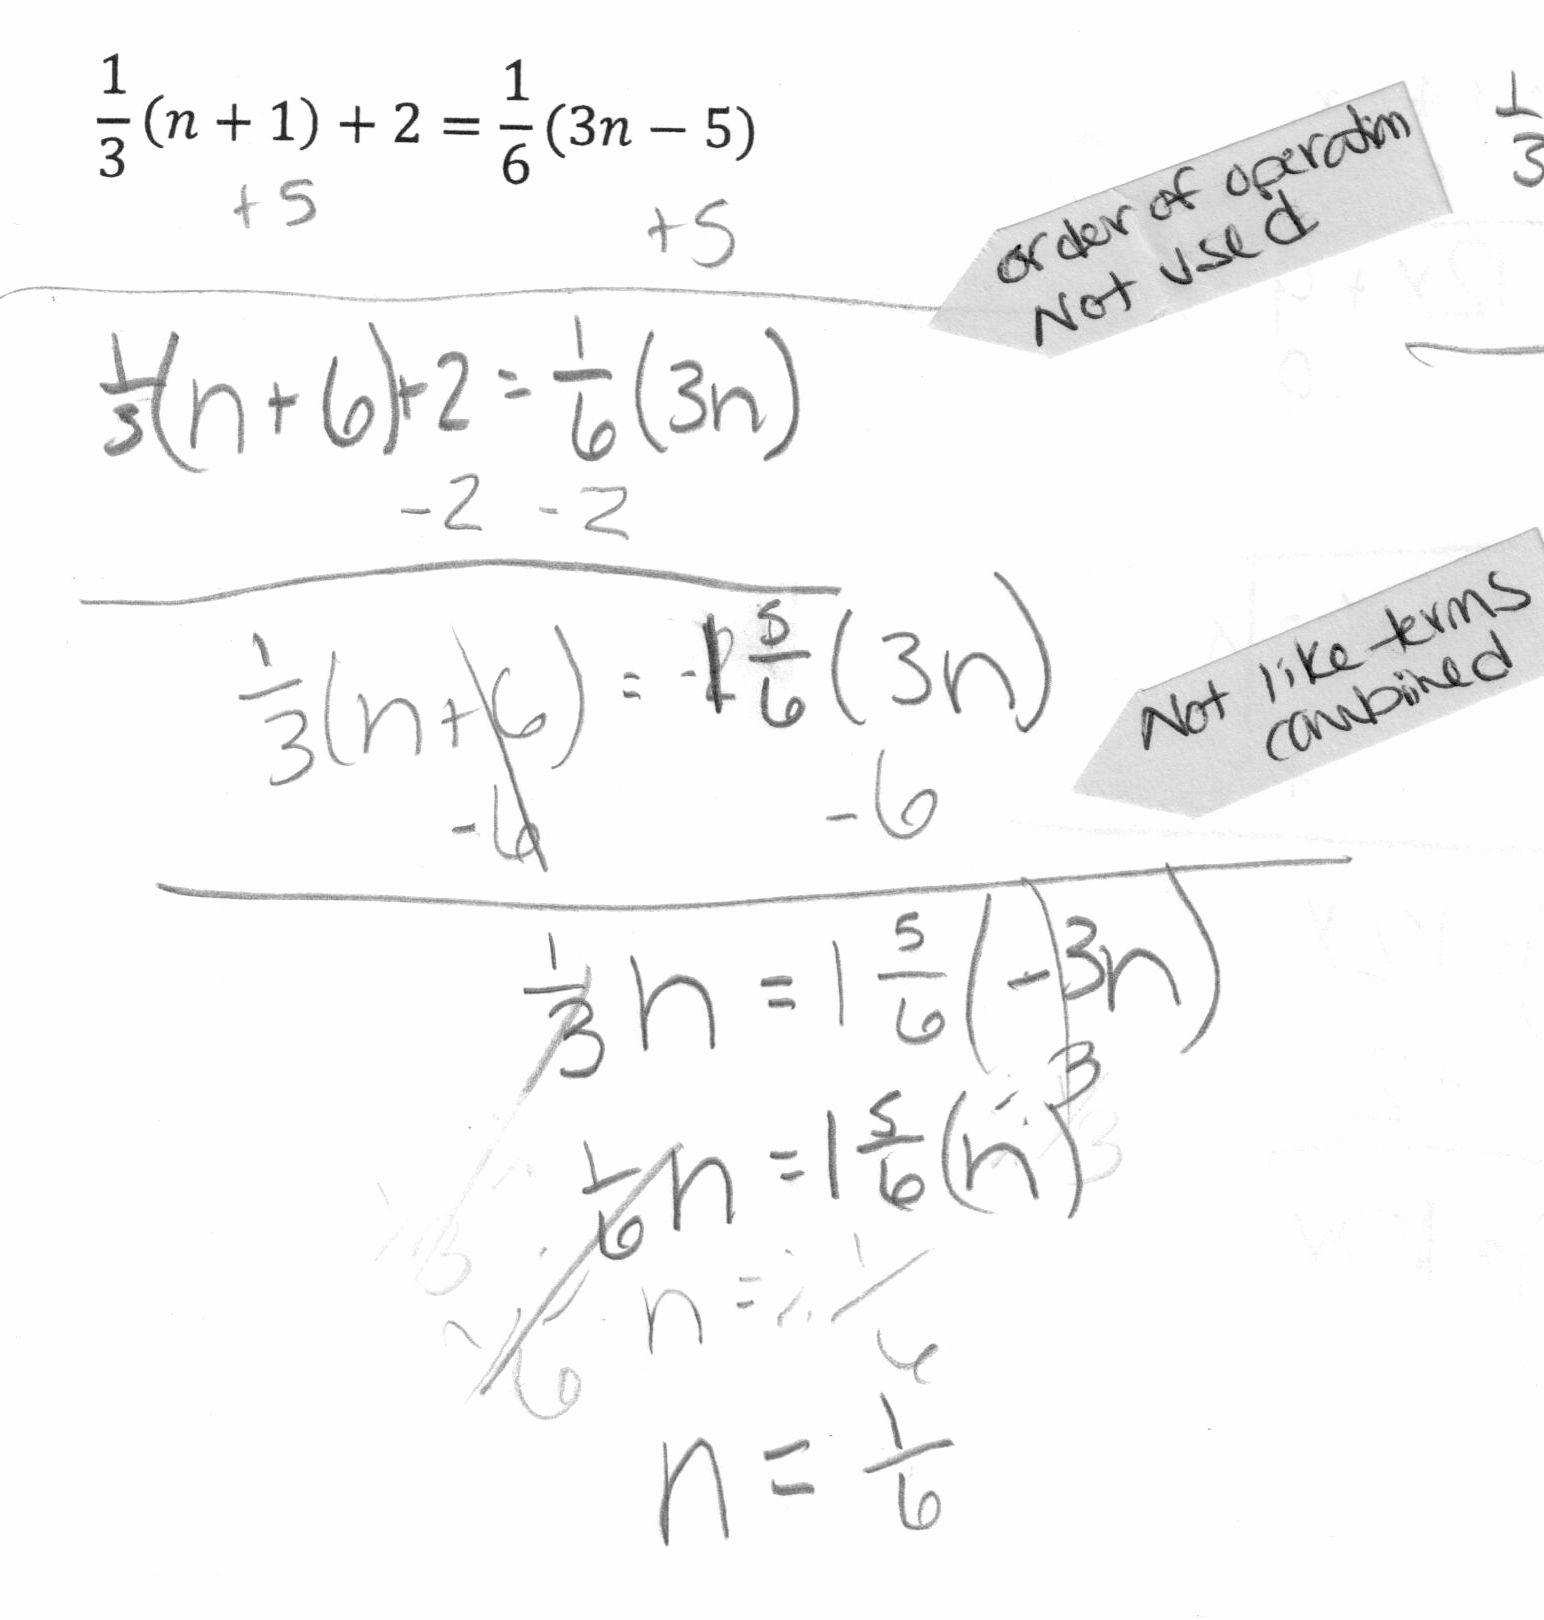 Distributive Property Worksheets 7th Grade